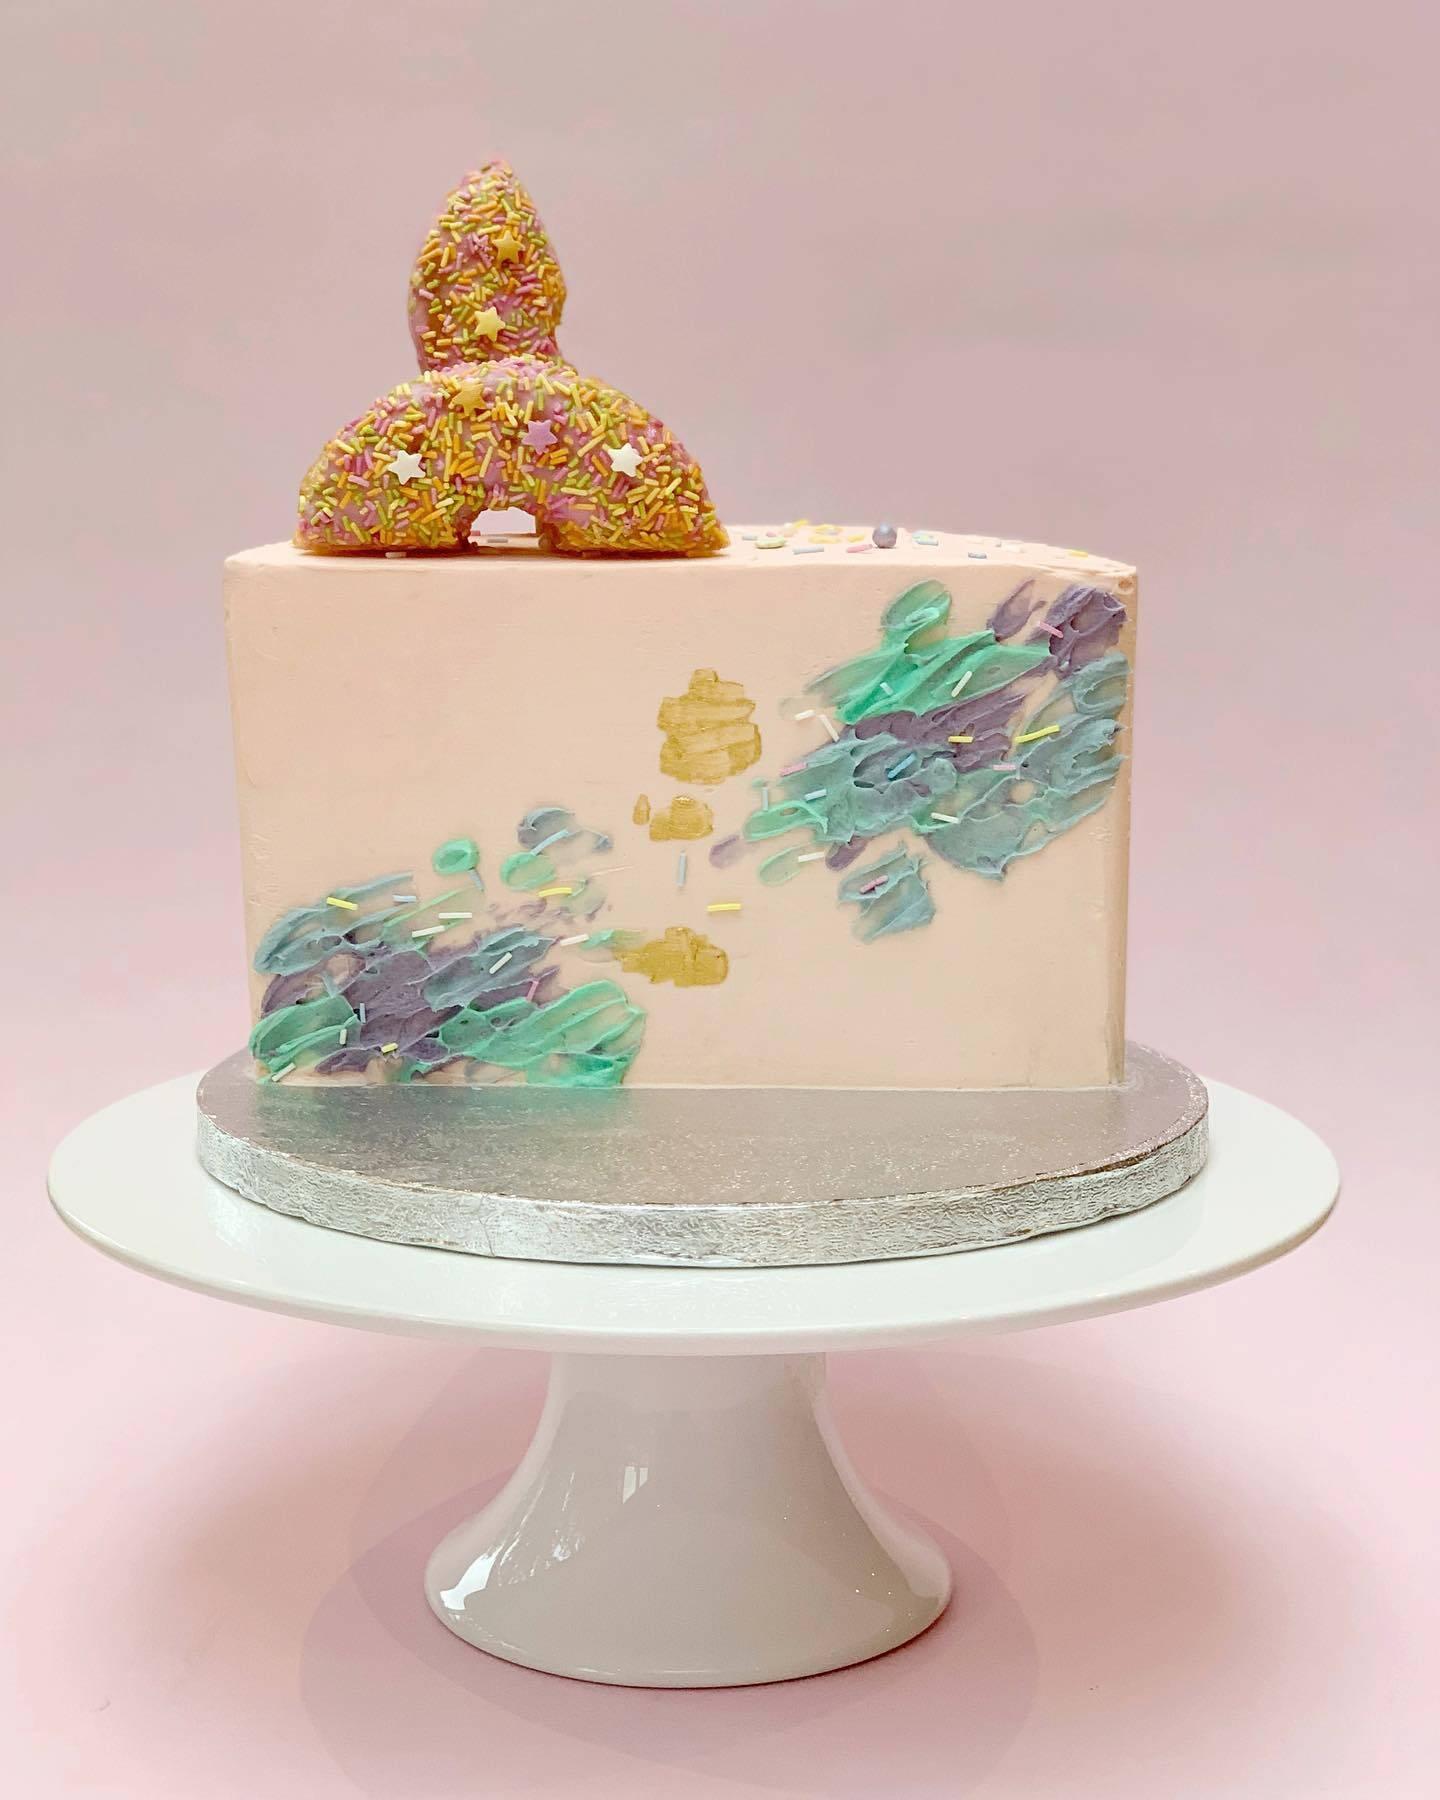 Half Year Celebration – Half a Cake